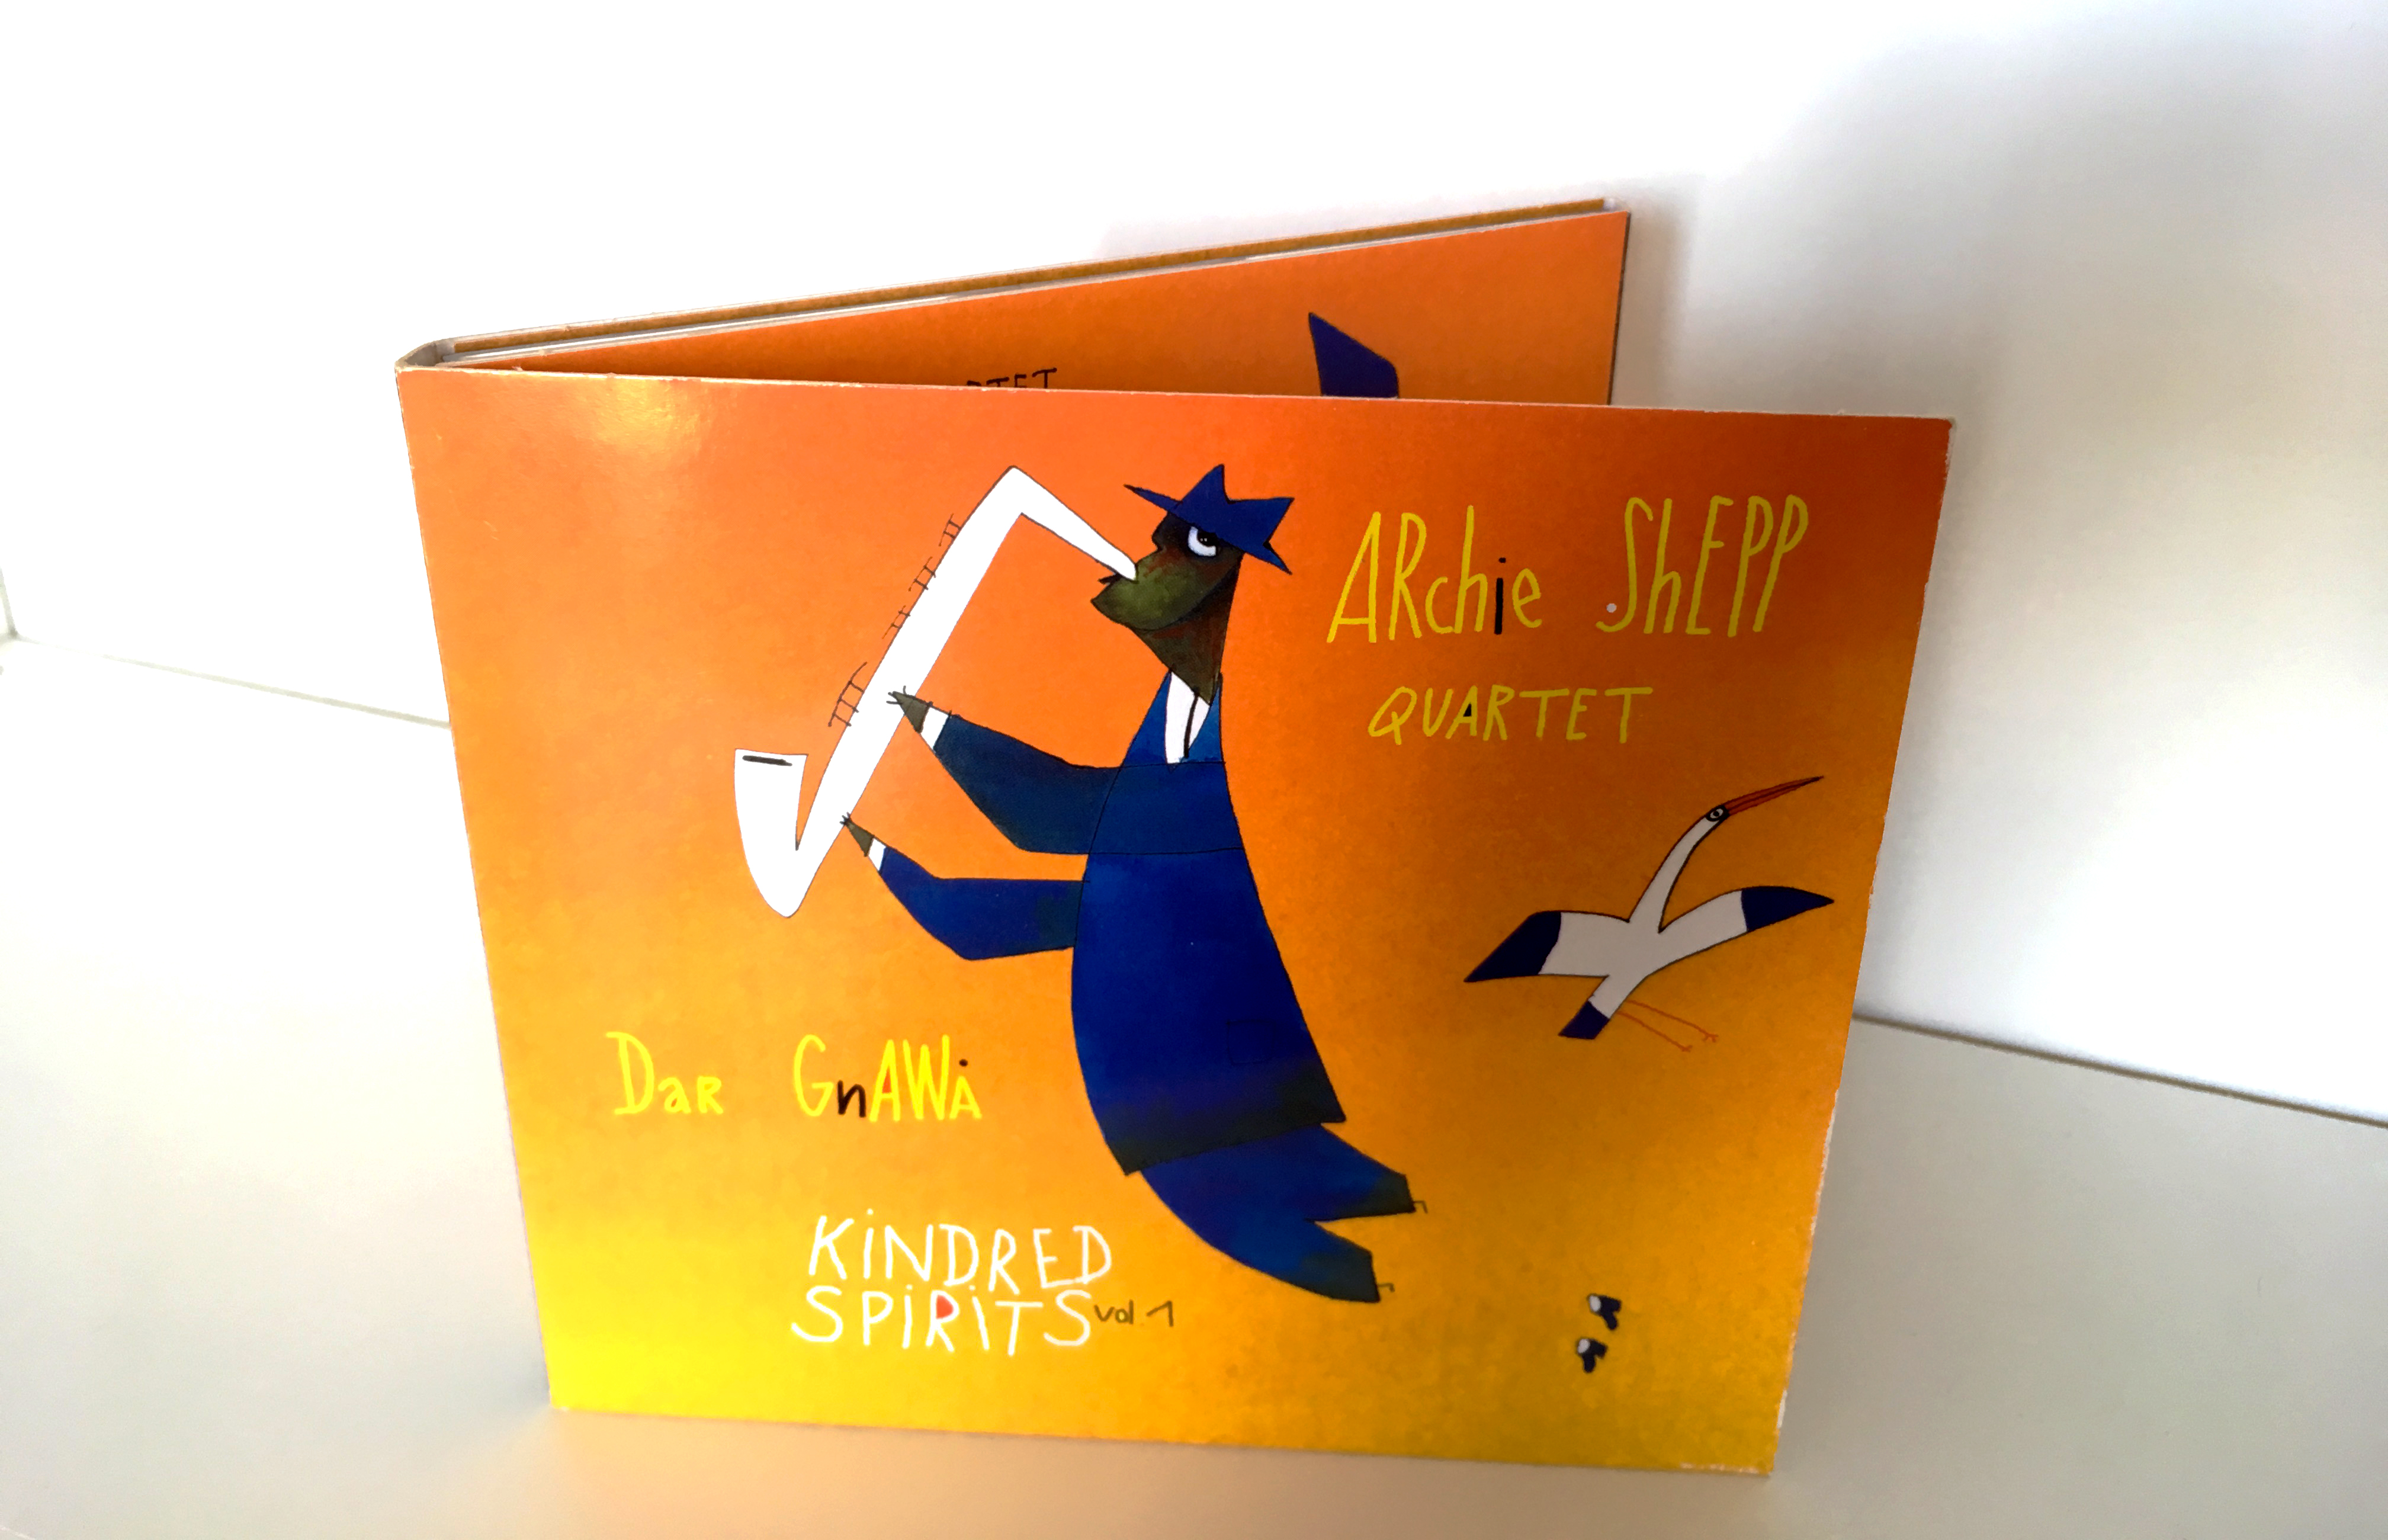 ARCHIE SHEPP- KINDRED SPIRIT - 2005